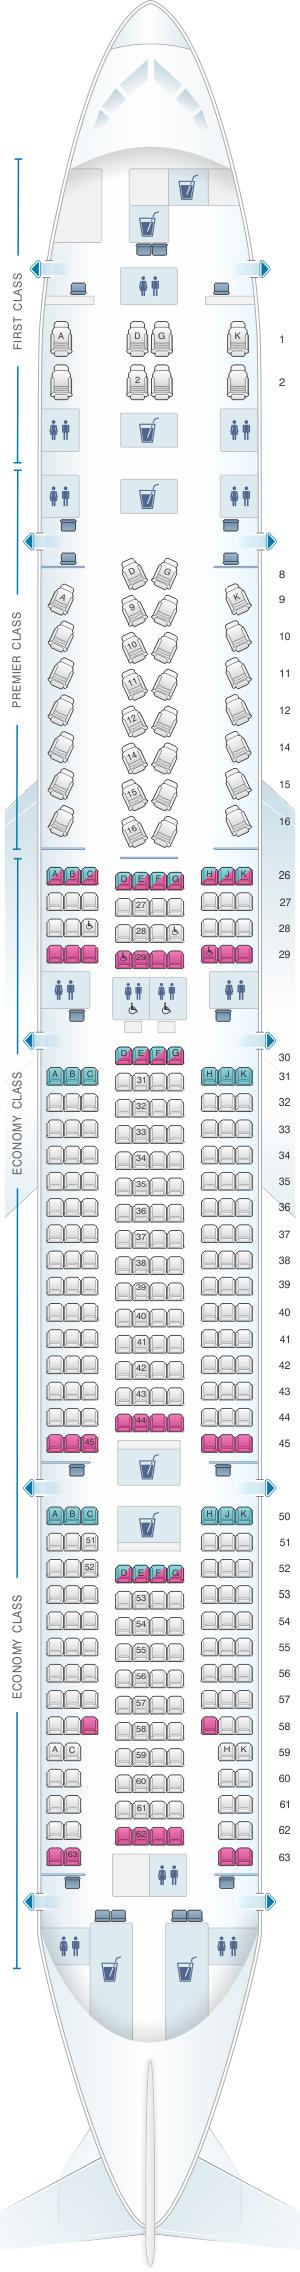 Seat map for Jet Airways Boeing B777 300ER 346PAX